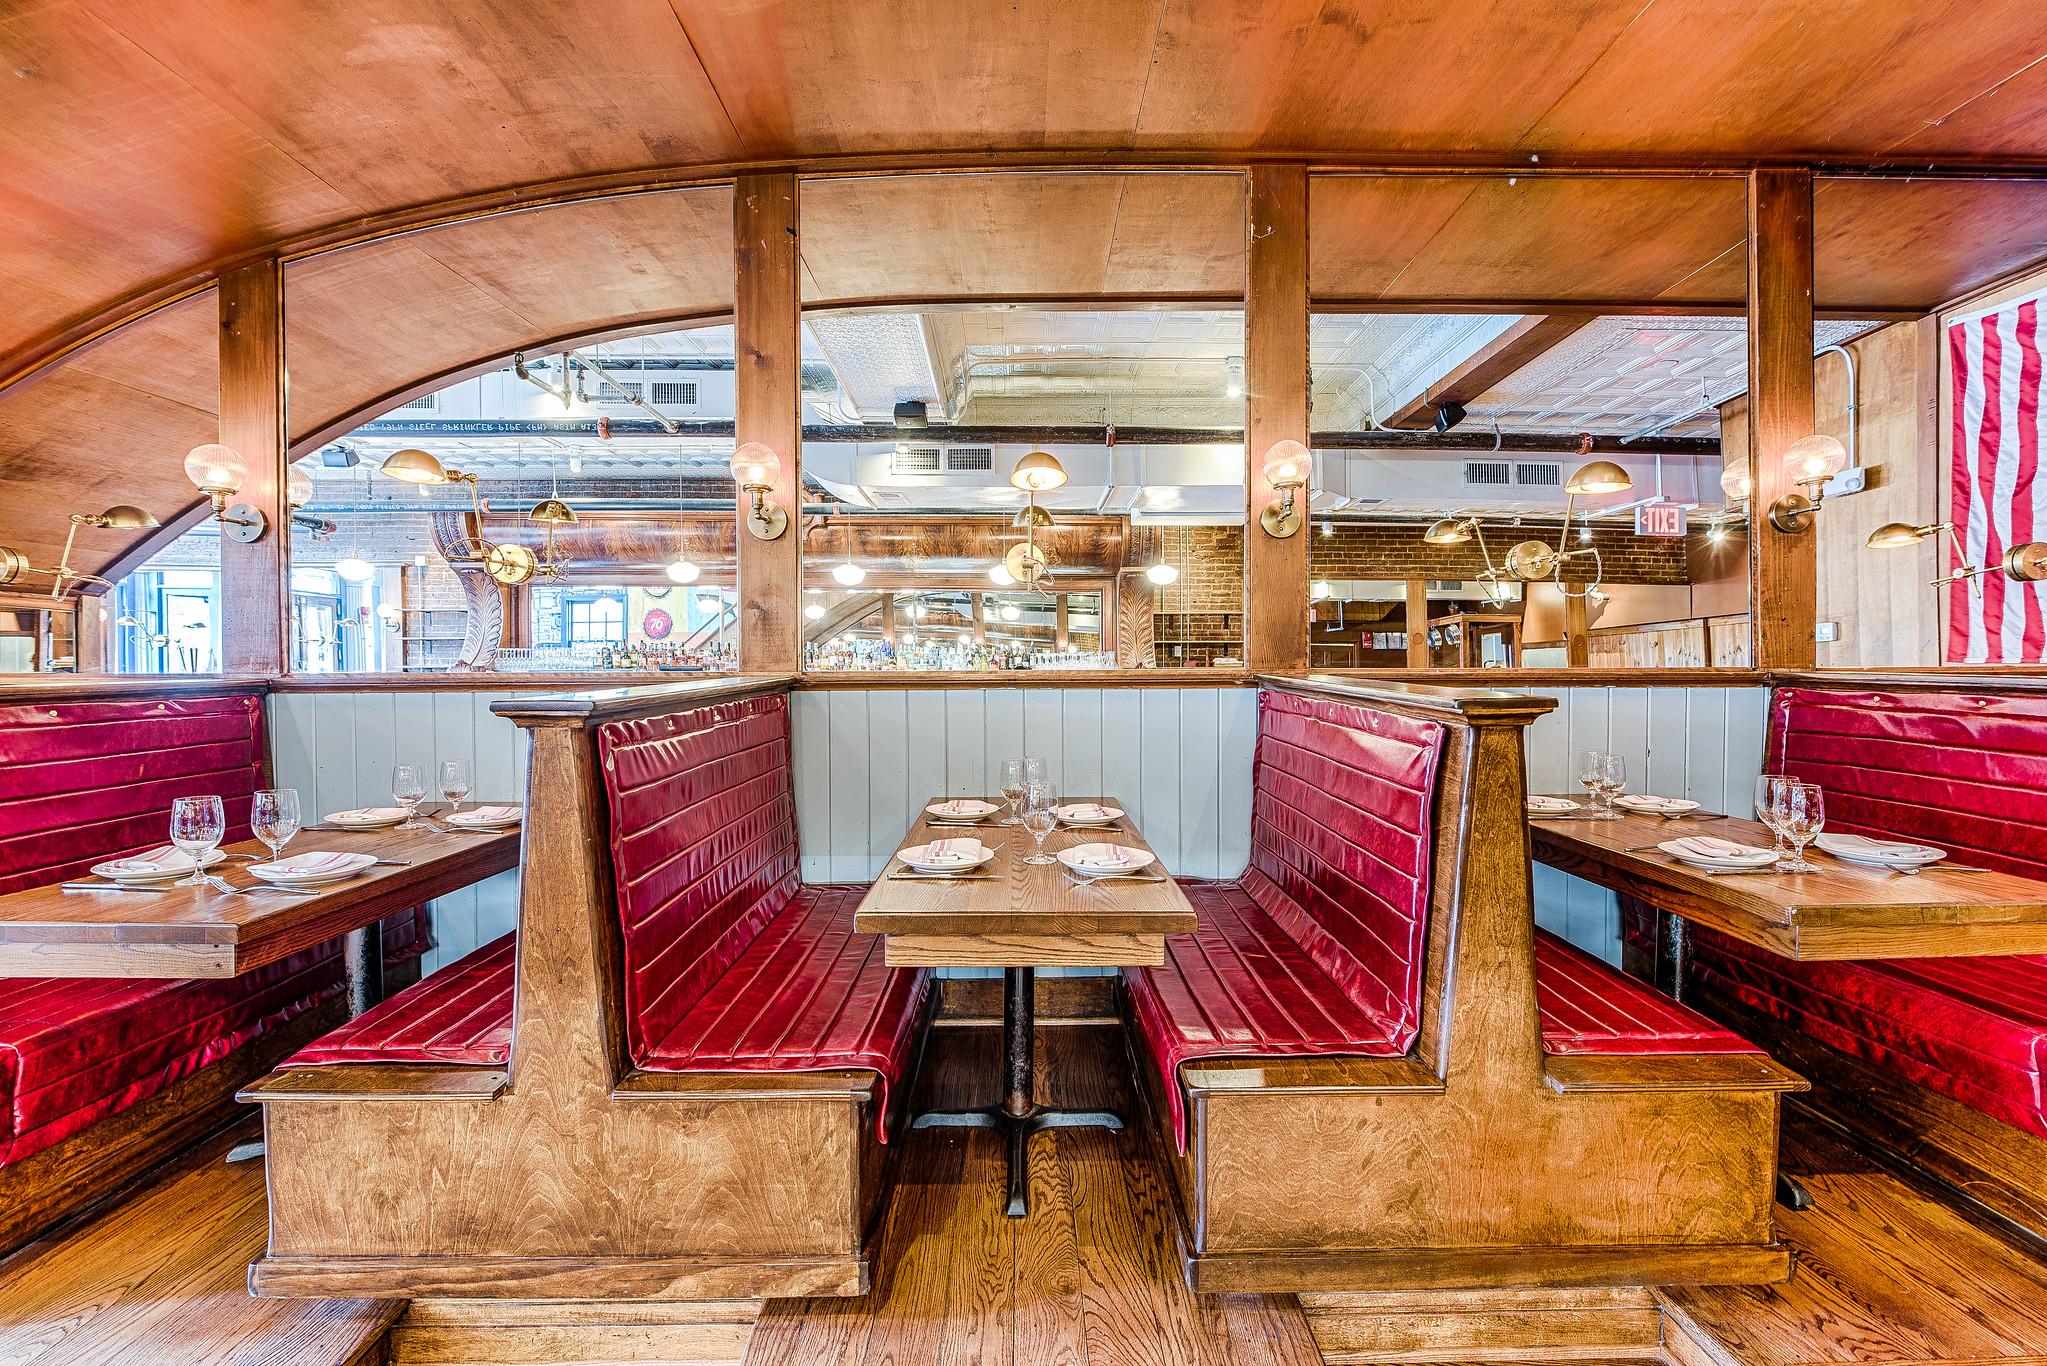 10-studio-saint-bars-and-restaurants-america-eats-tavern-washington-dc-lopez.jpg